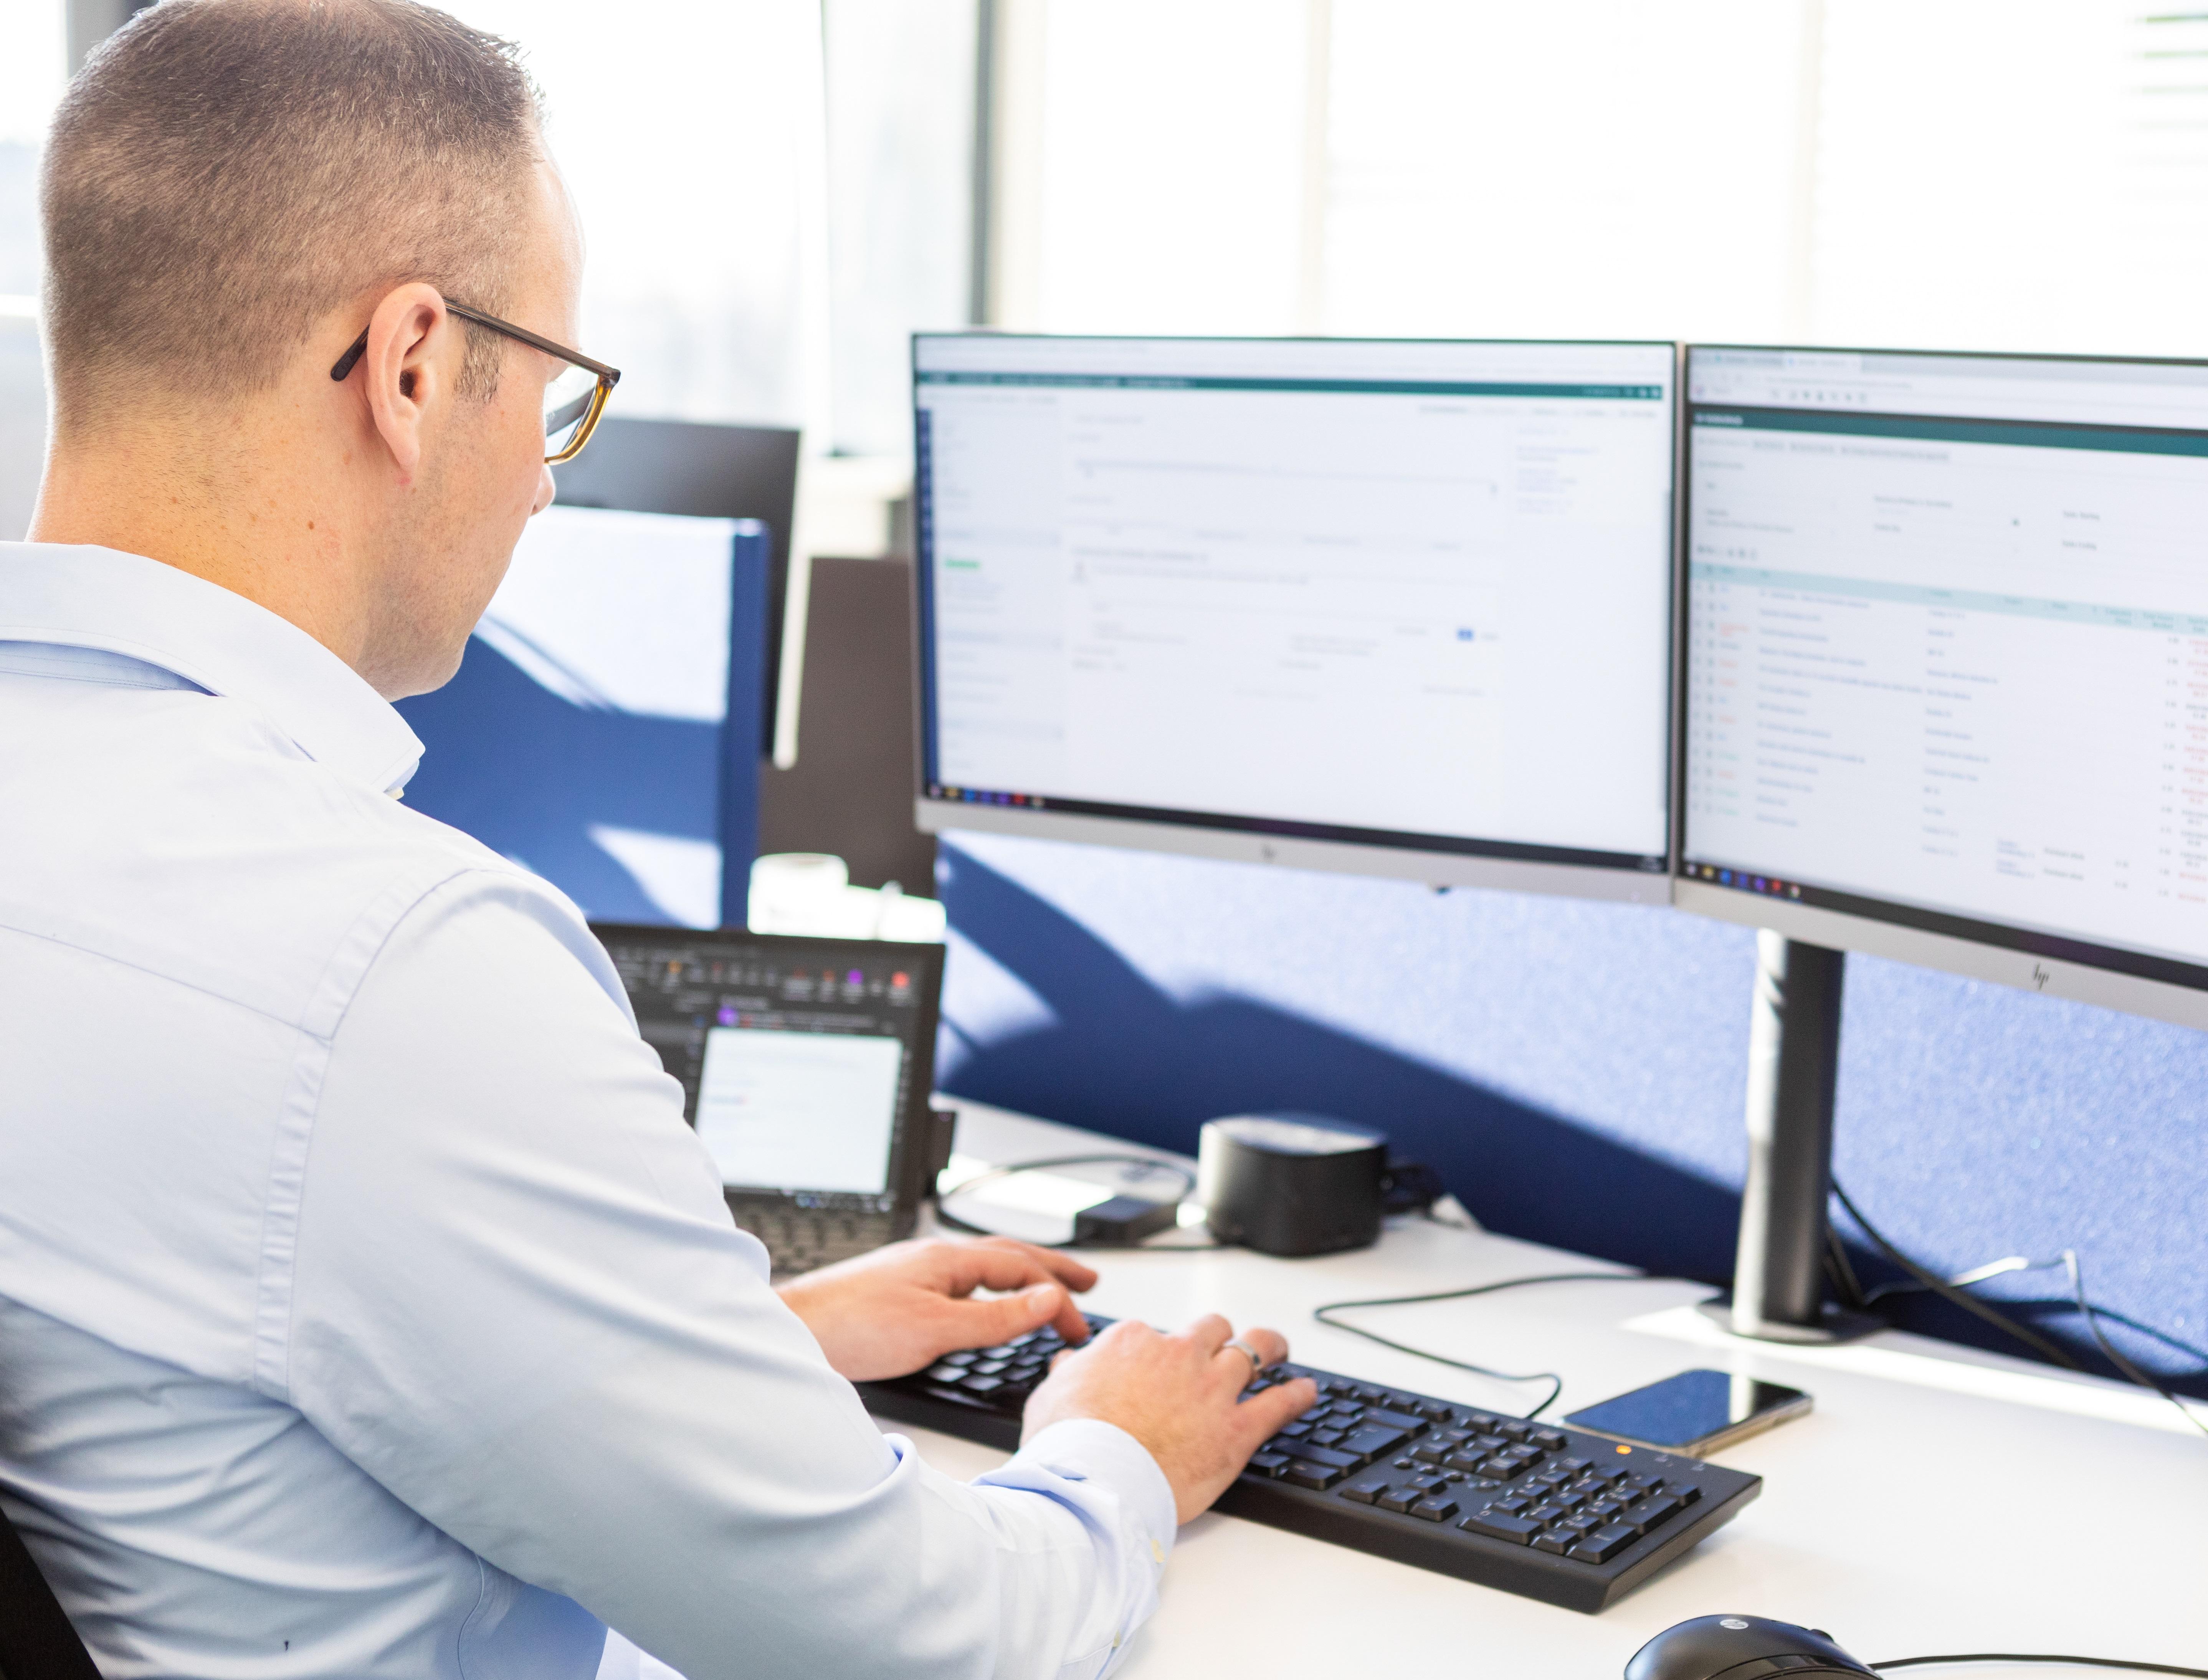 ICT Security - whitepaper Fourtop